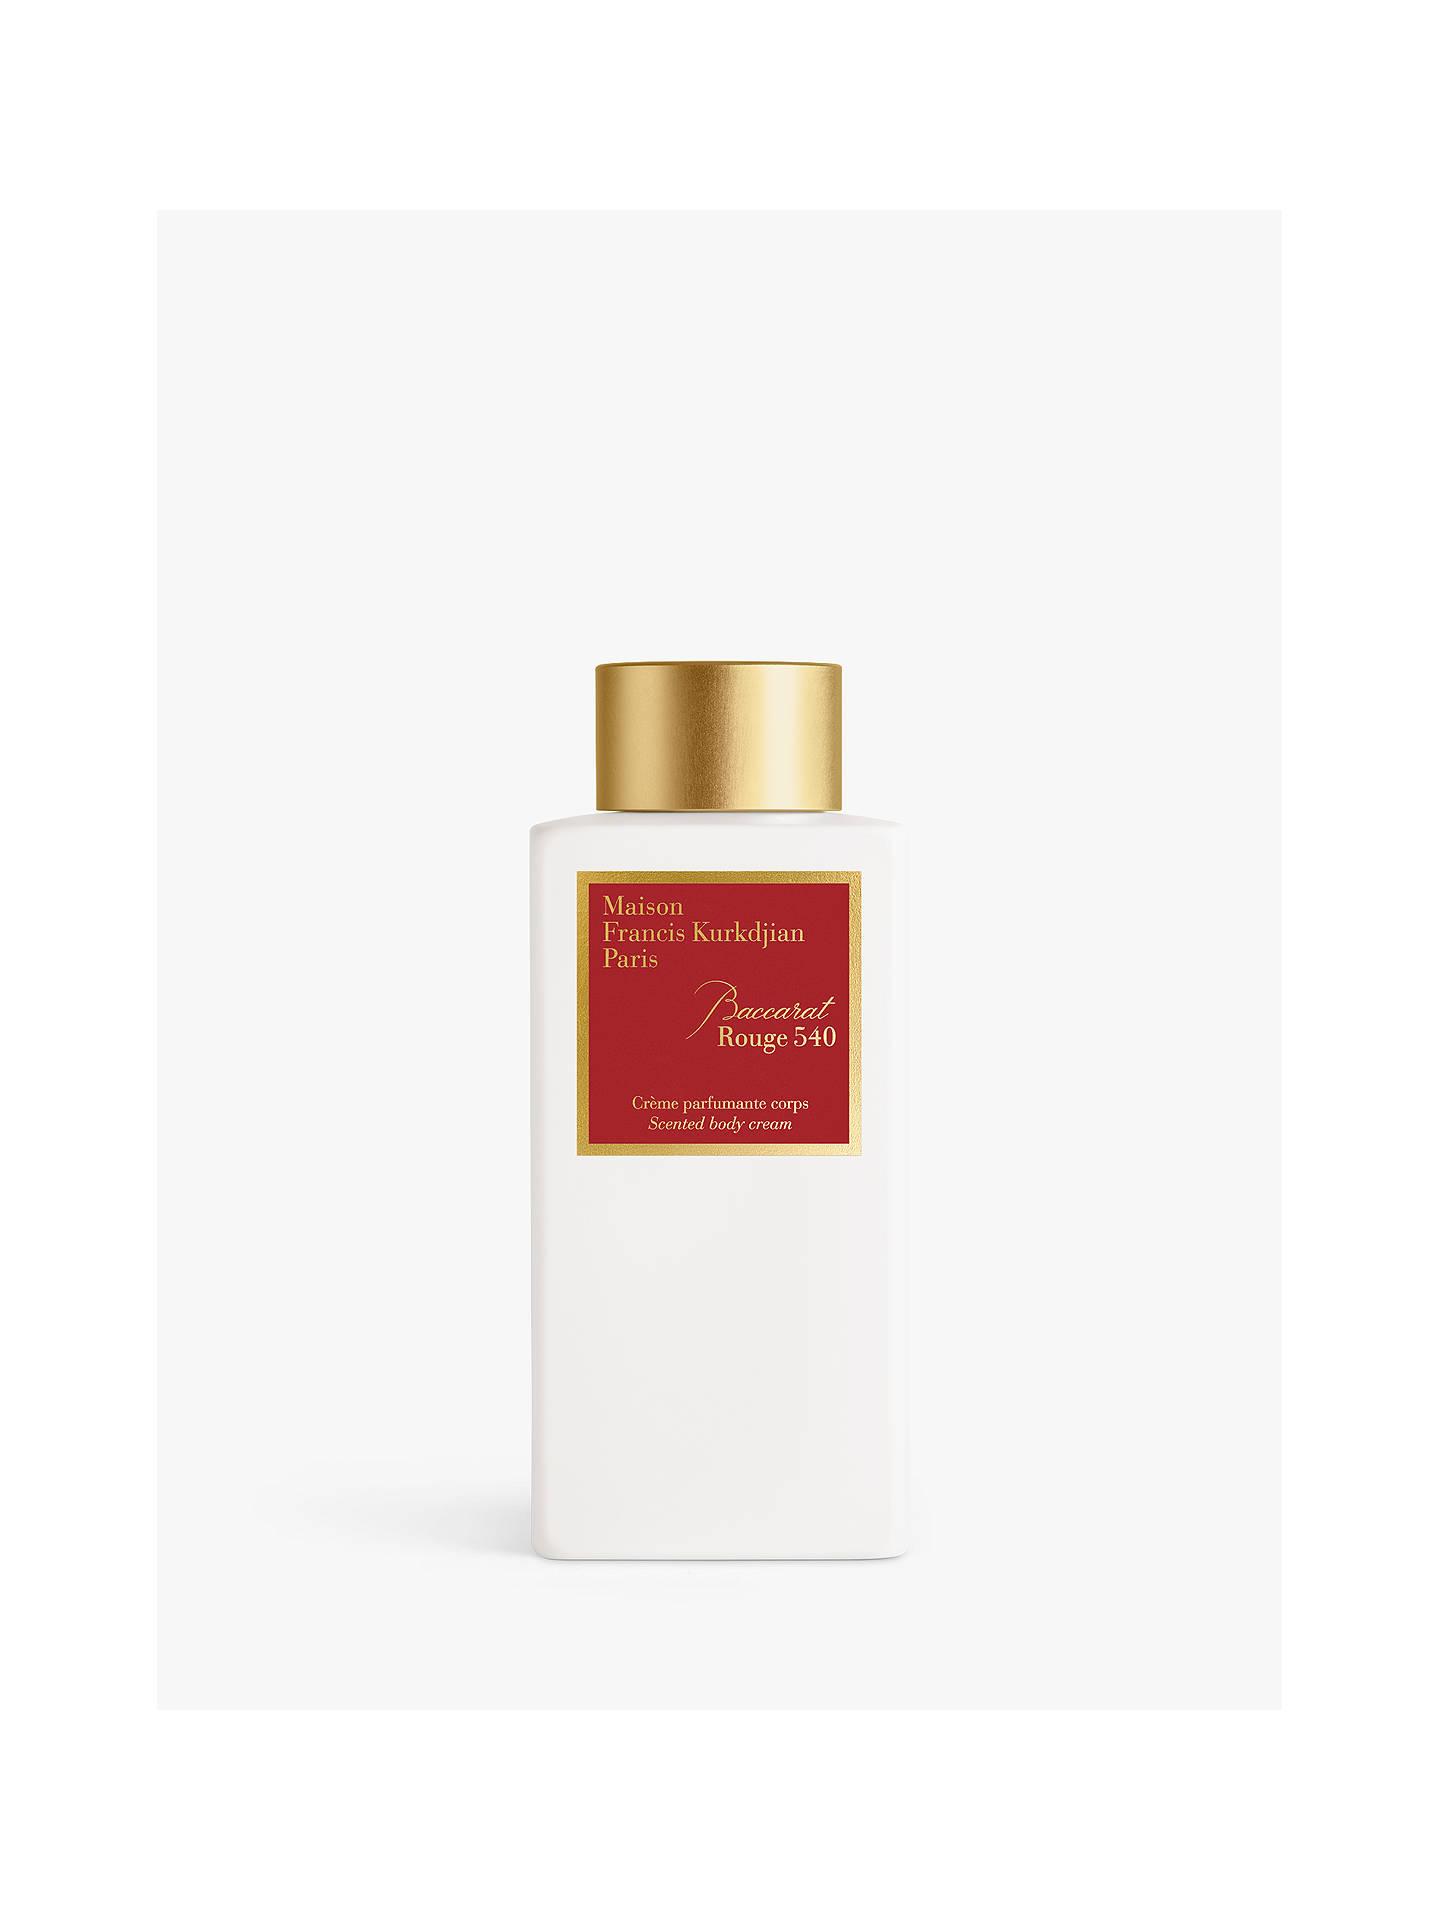 40f6979945f8 Maison Francis Kurkdjian Baccarat Rouge 540 Scented Body Cream ...